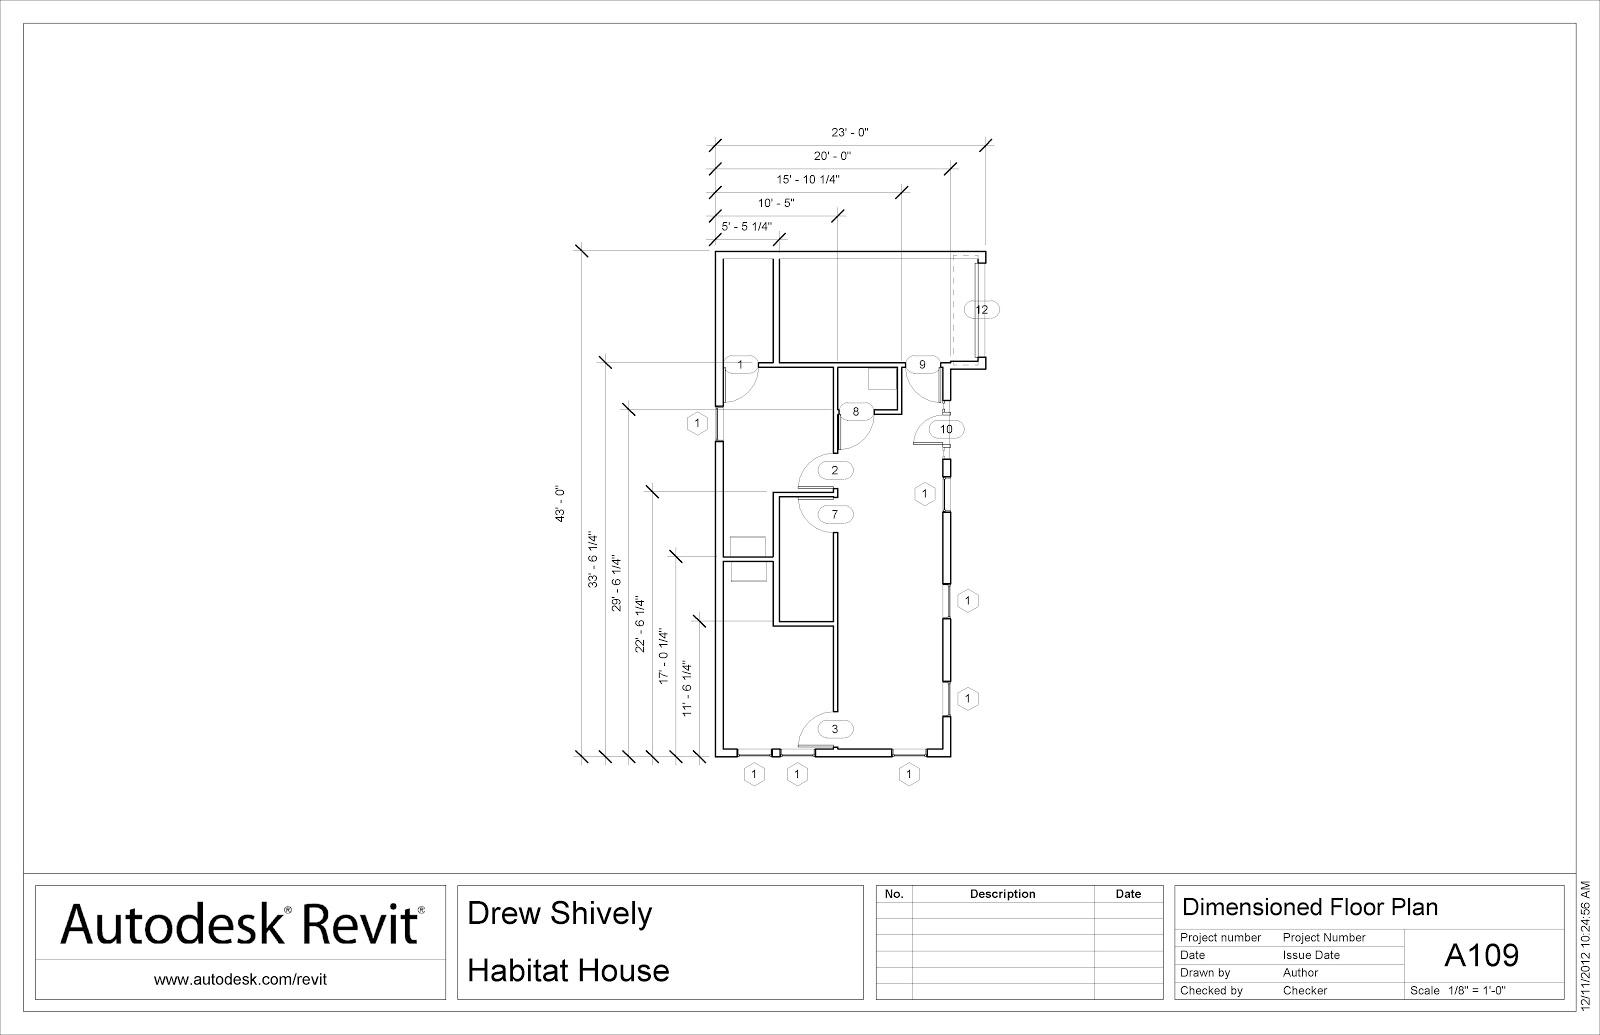 dimesioned floor plans